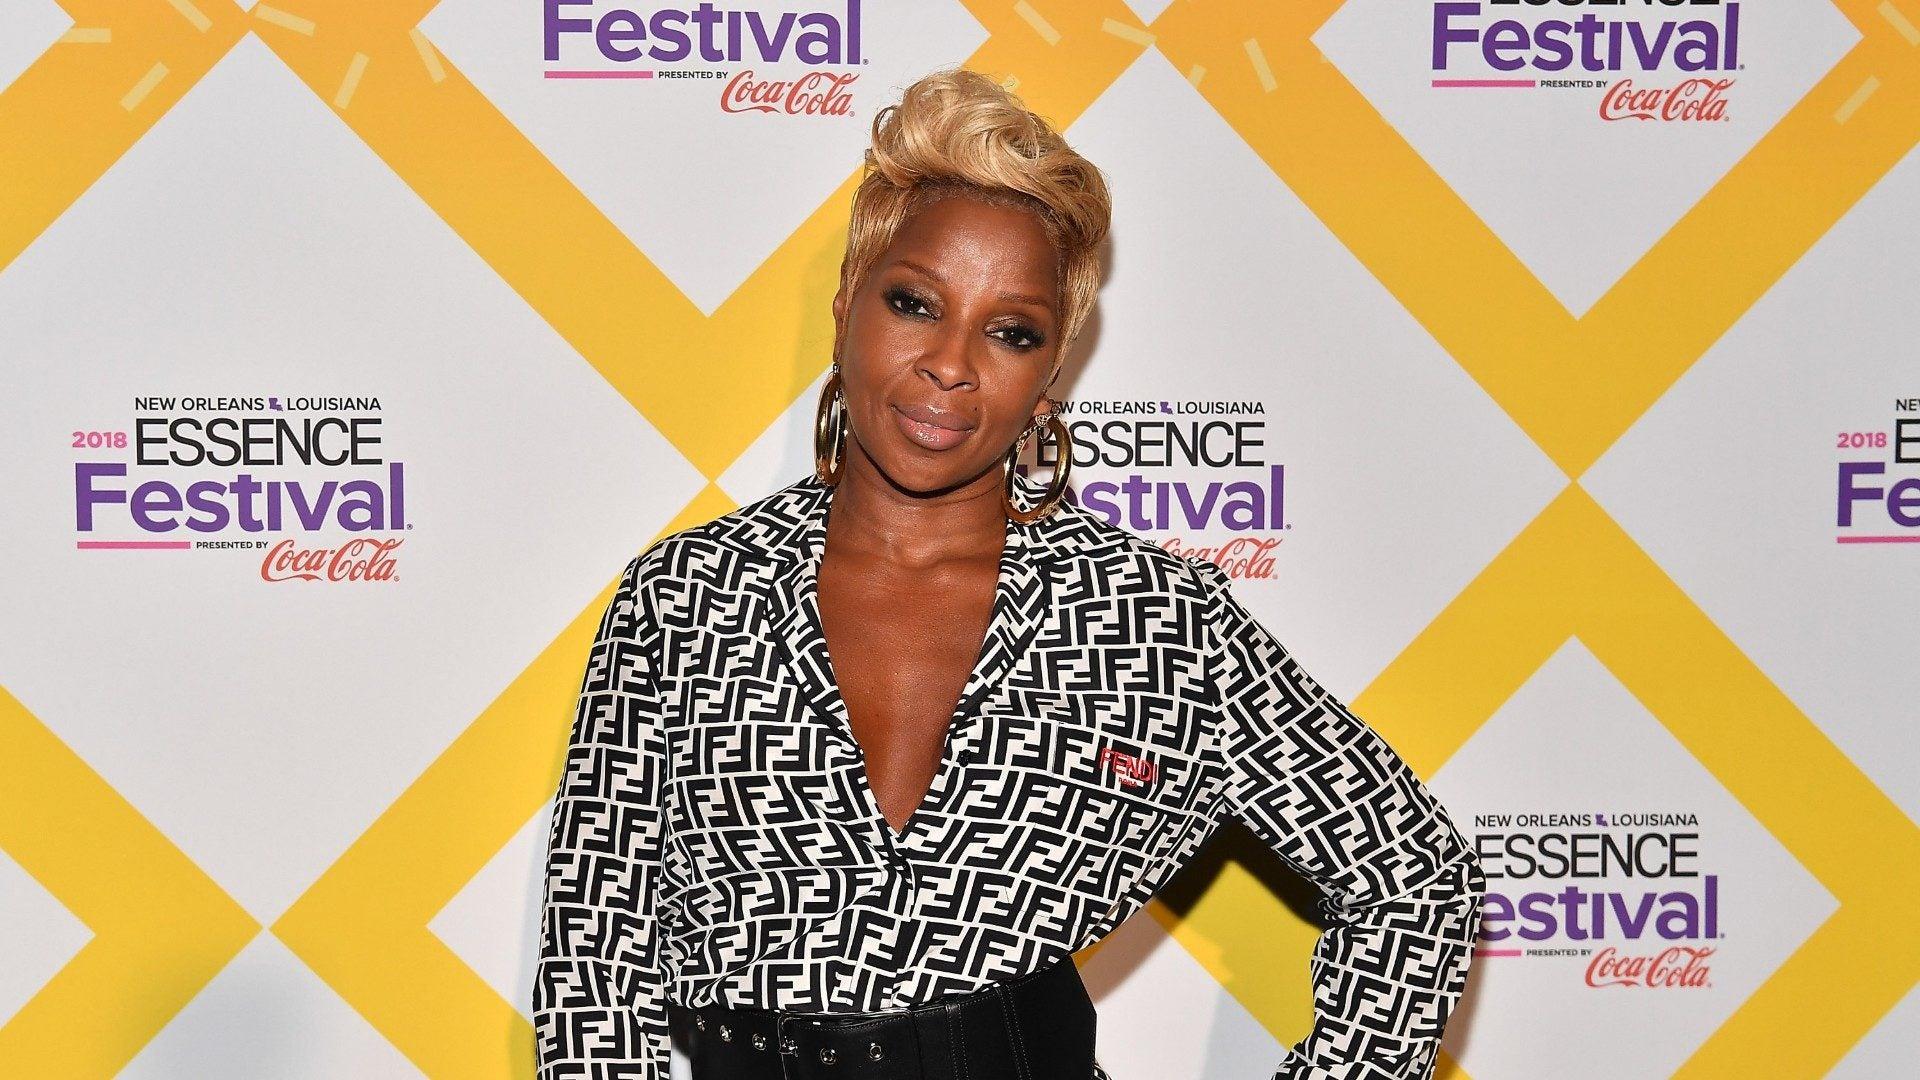 ESSENCE Festival Headliner Mary J. Blige Gave Us 25 Years Of Beauty